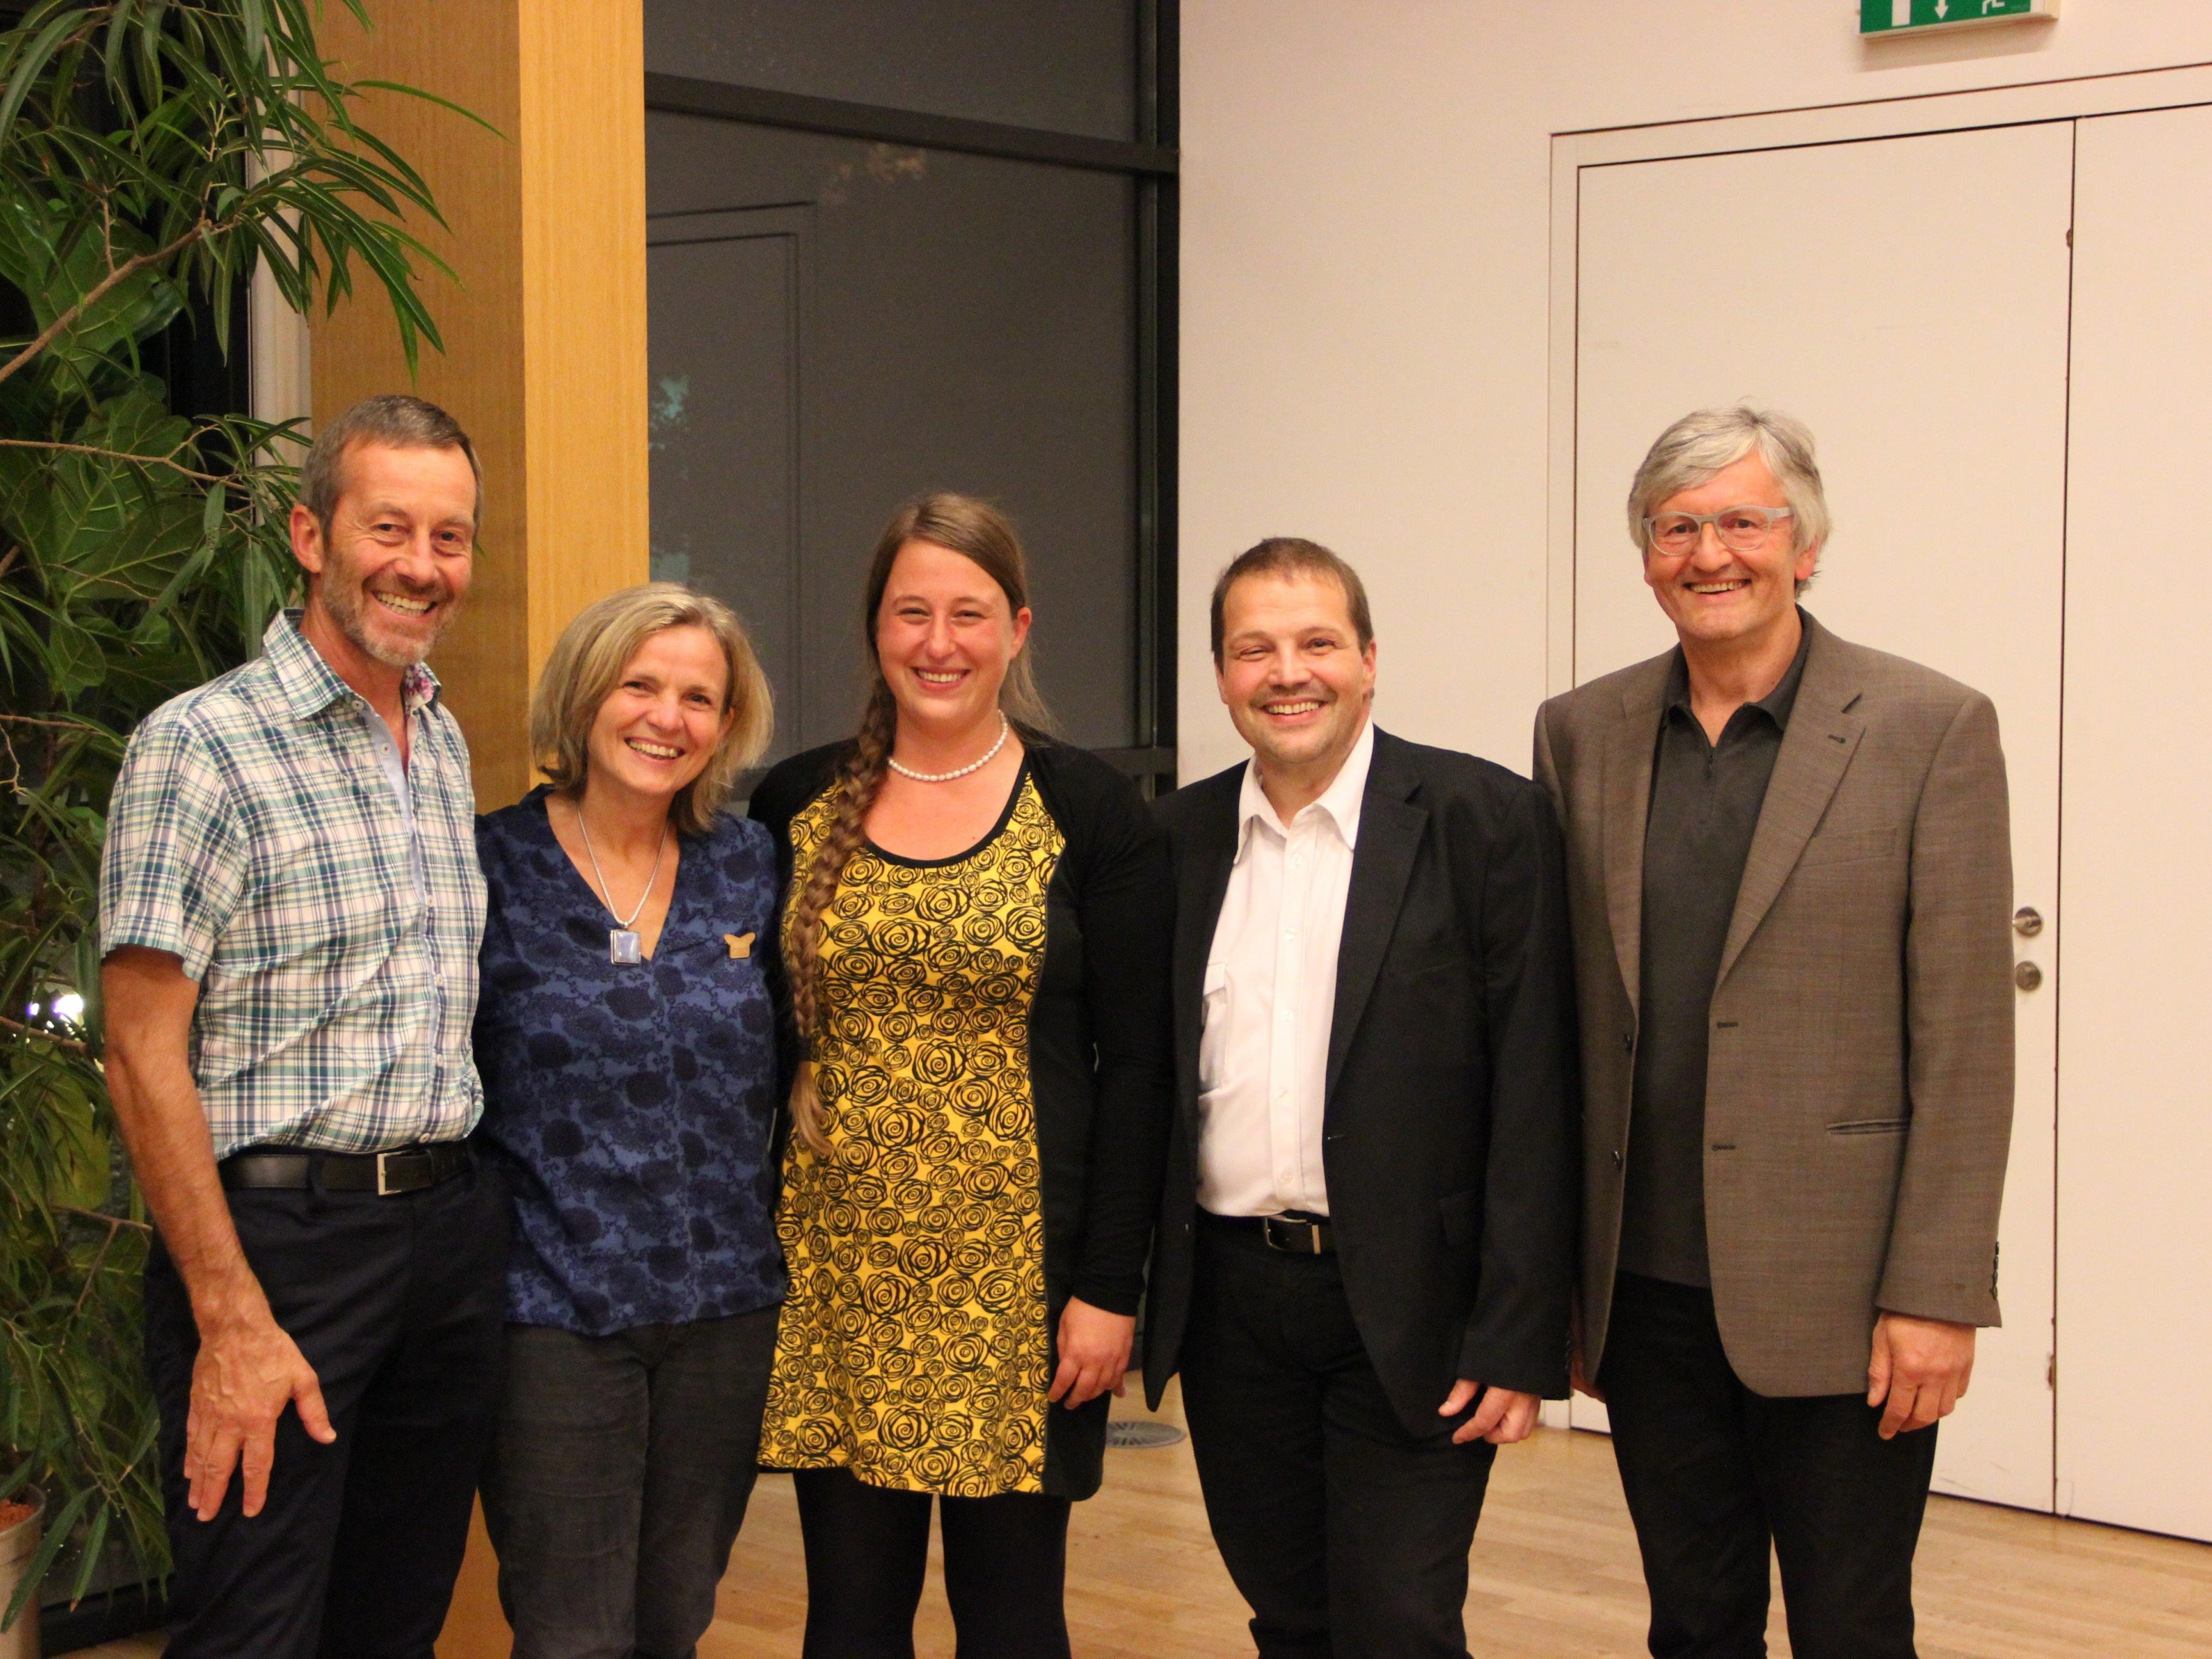 v. l. Prof. Günter Ladstätter, Mag. Christiane Machold, Umweltreferentin Anna Waibel, MSc, StR. Günter Mathis, Dkfm. Ing. Roland Mangold